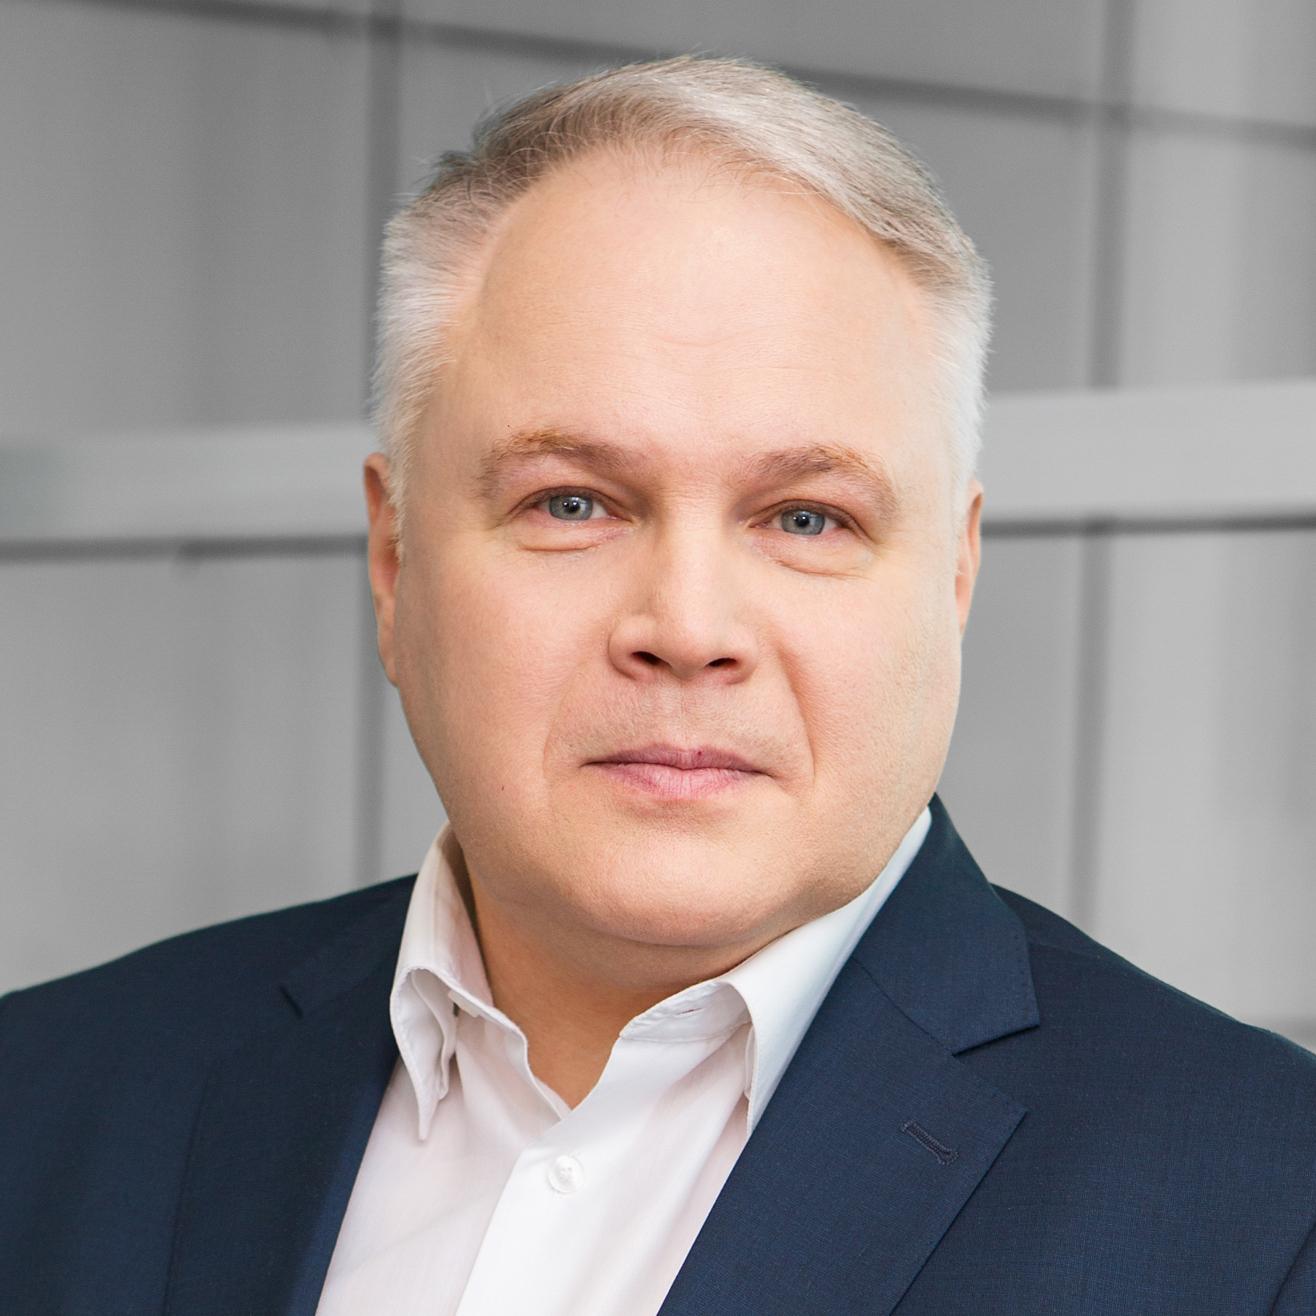 Кондратенко Владимир АИМ Холдинг-1